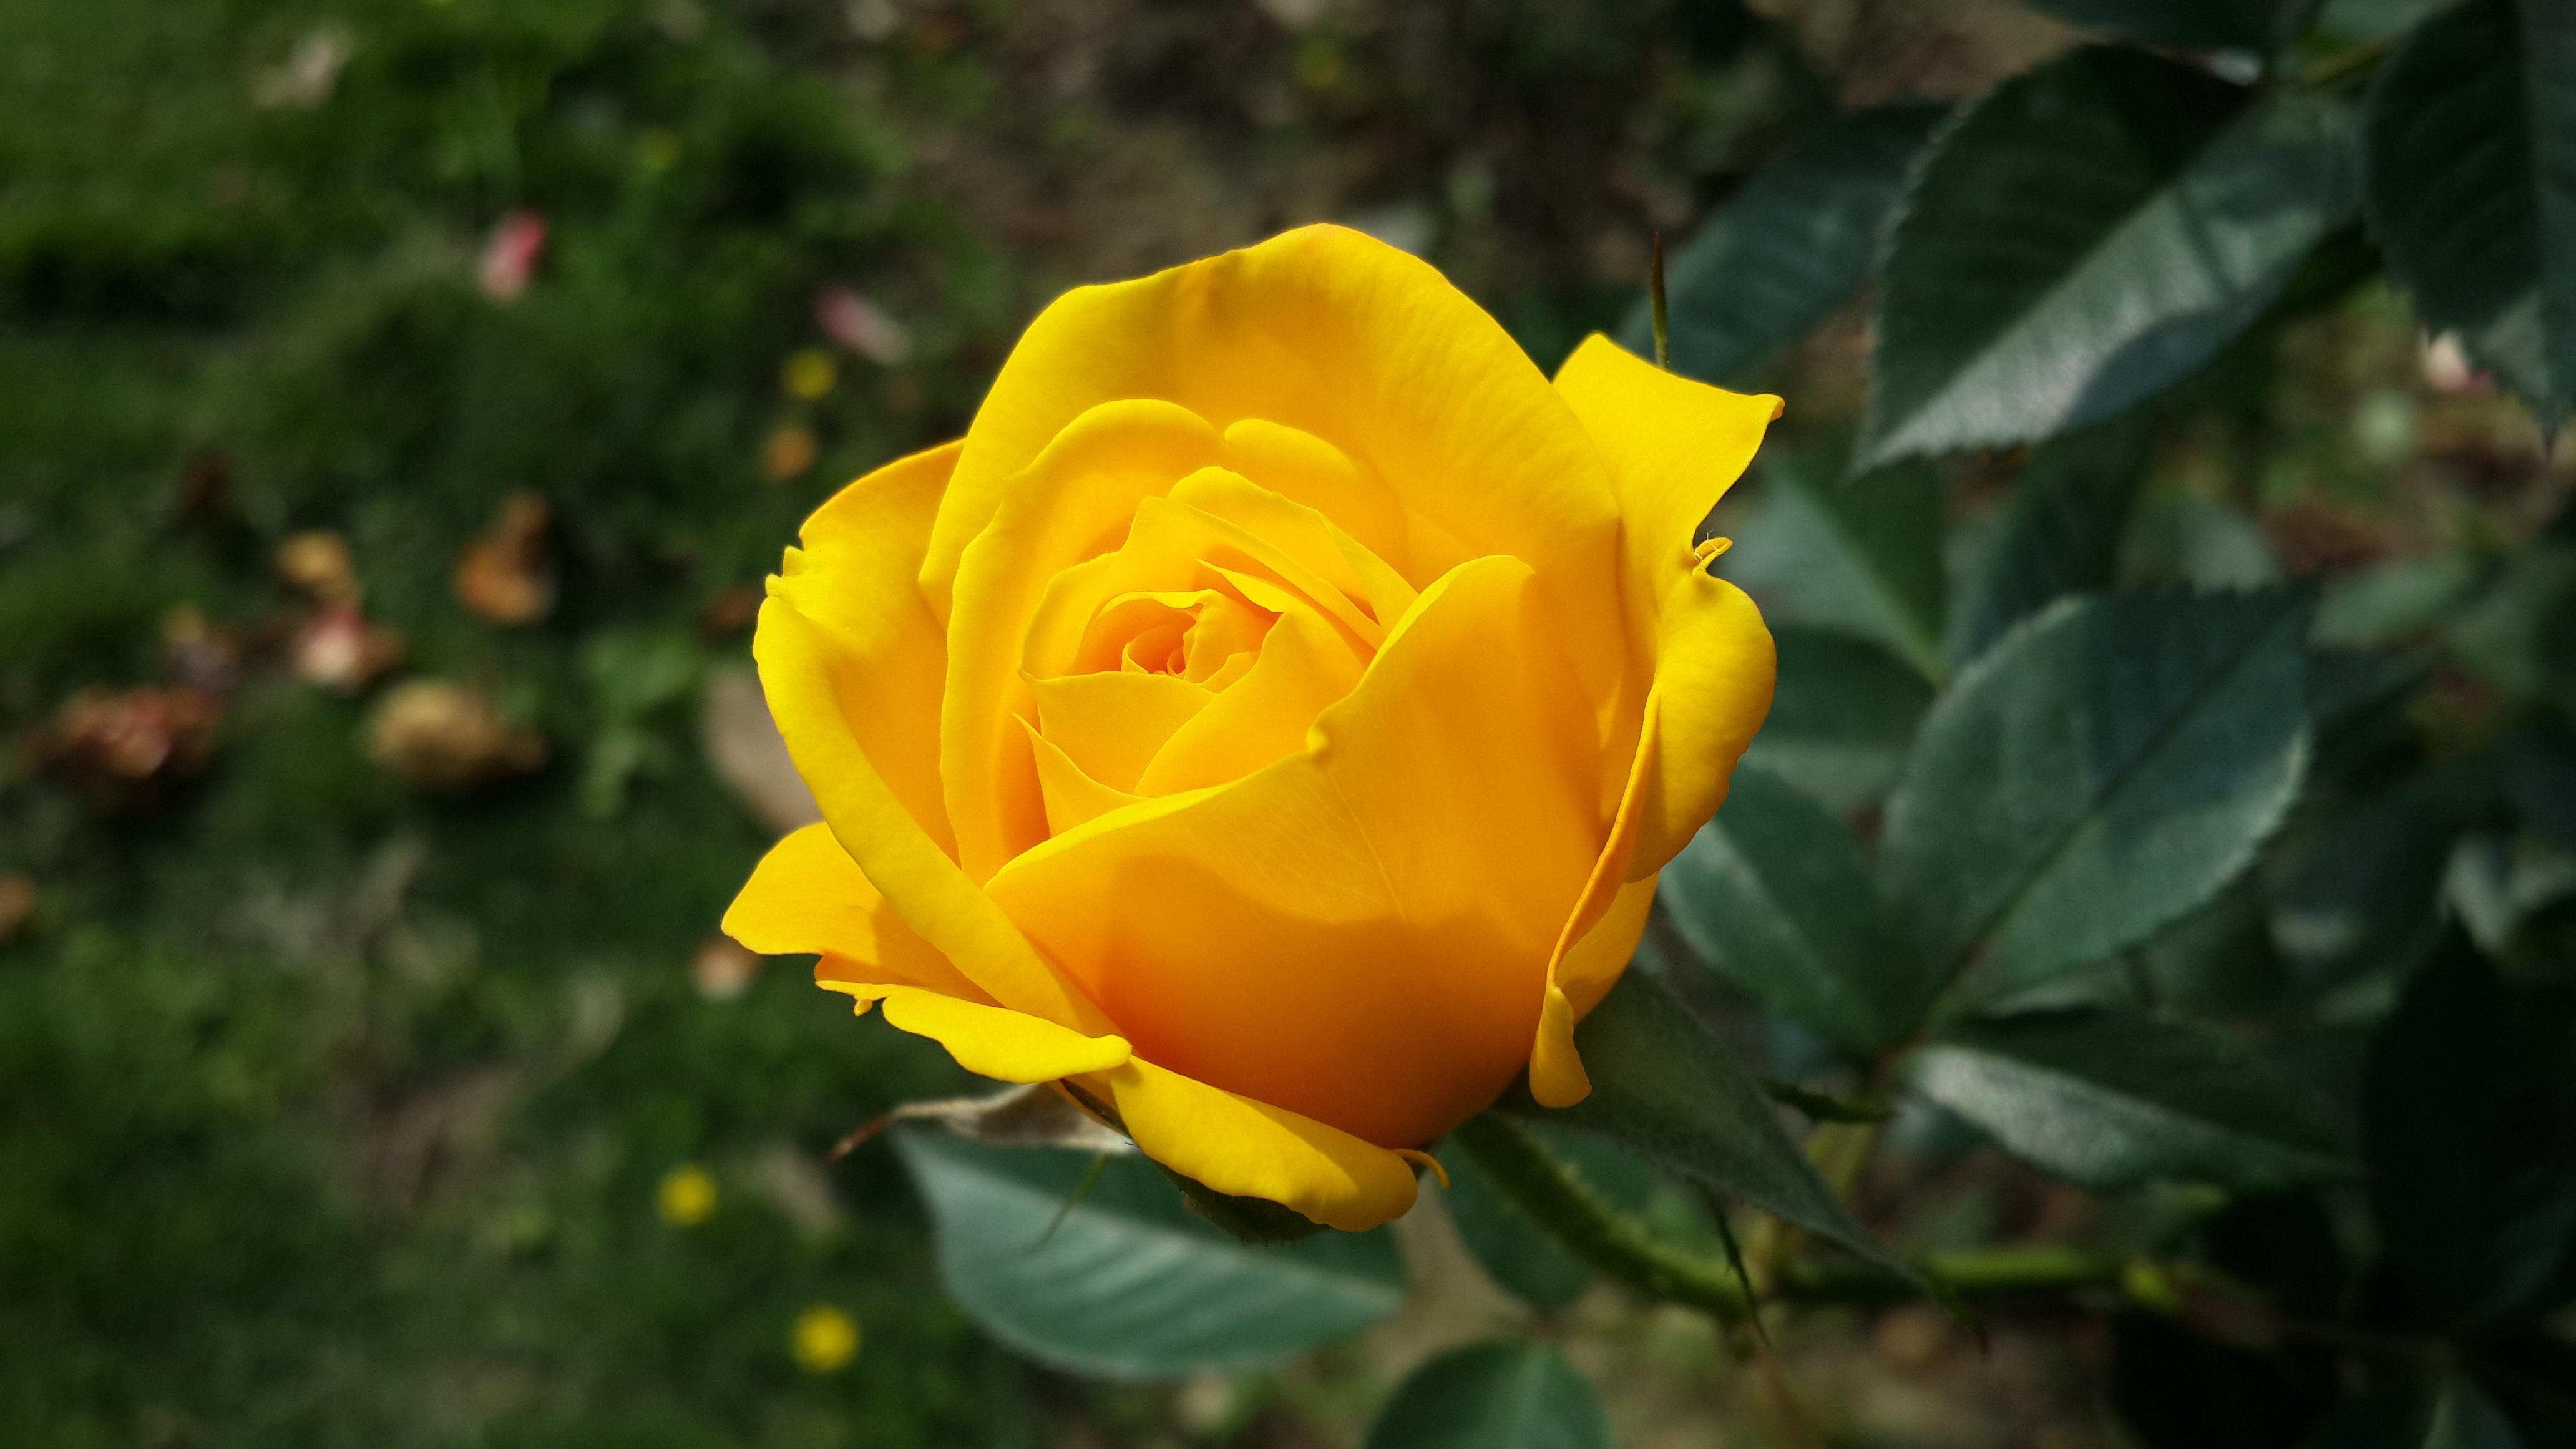 Free Images : Nature, Morning, Flower, Petal, Botany